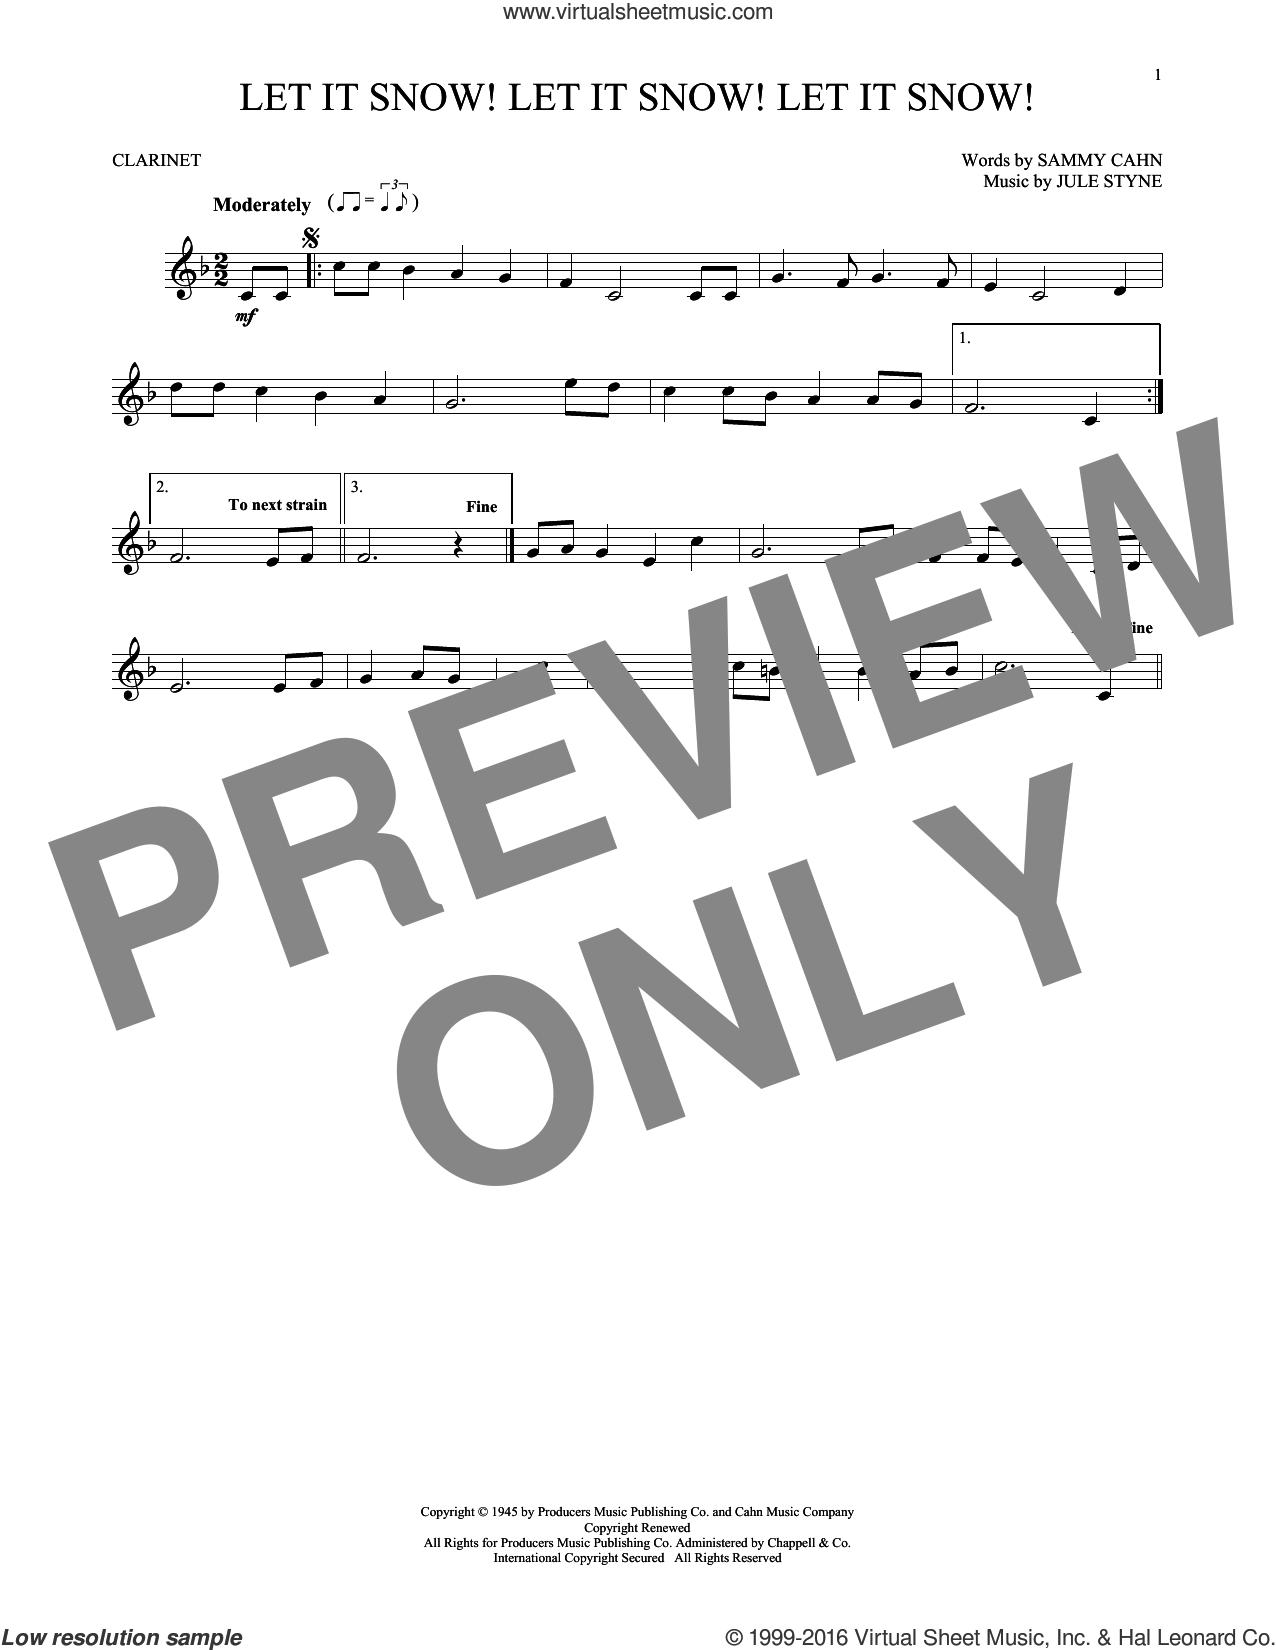 Let It Snow! Let It Snow! Let It Snow! sheet music for clarinet solo by Sammy Cahn, Jule Styne and Sammy Cahn & Julie Styne, intermediate skill level